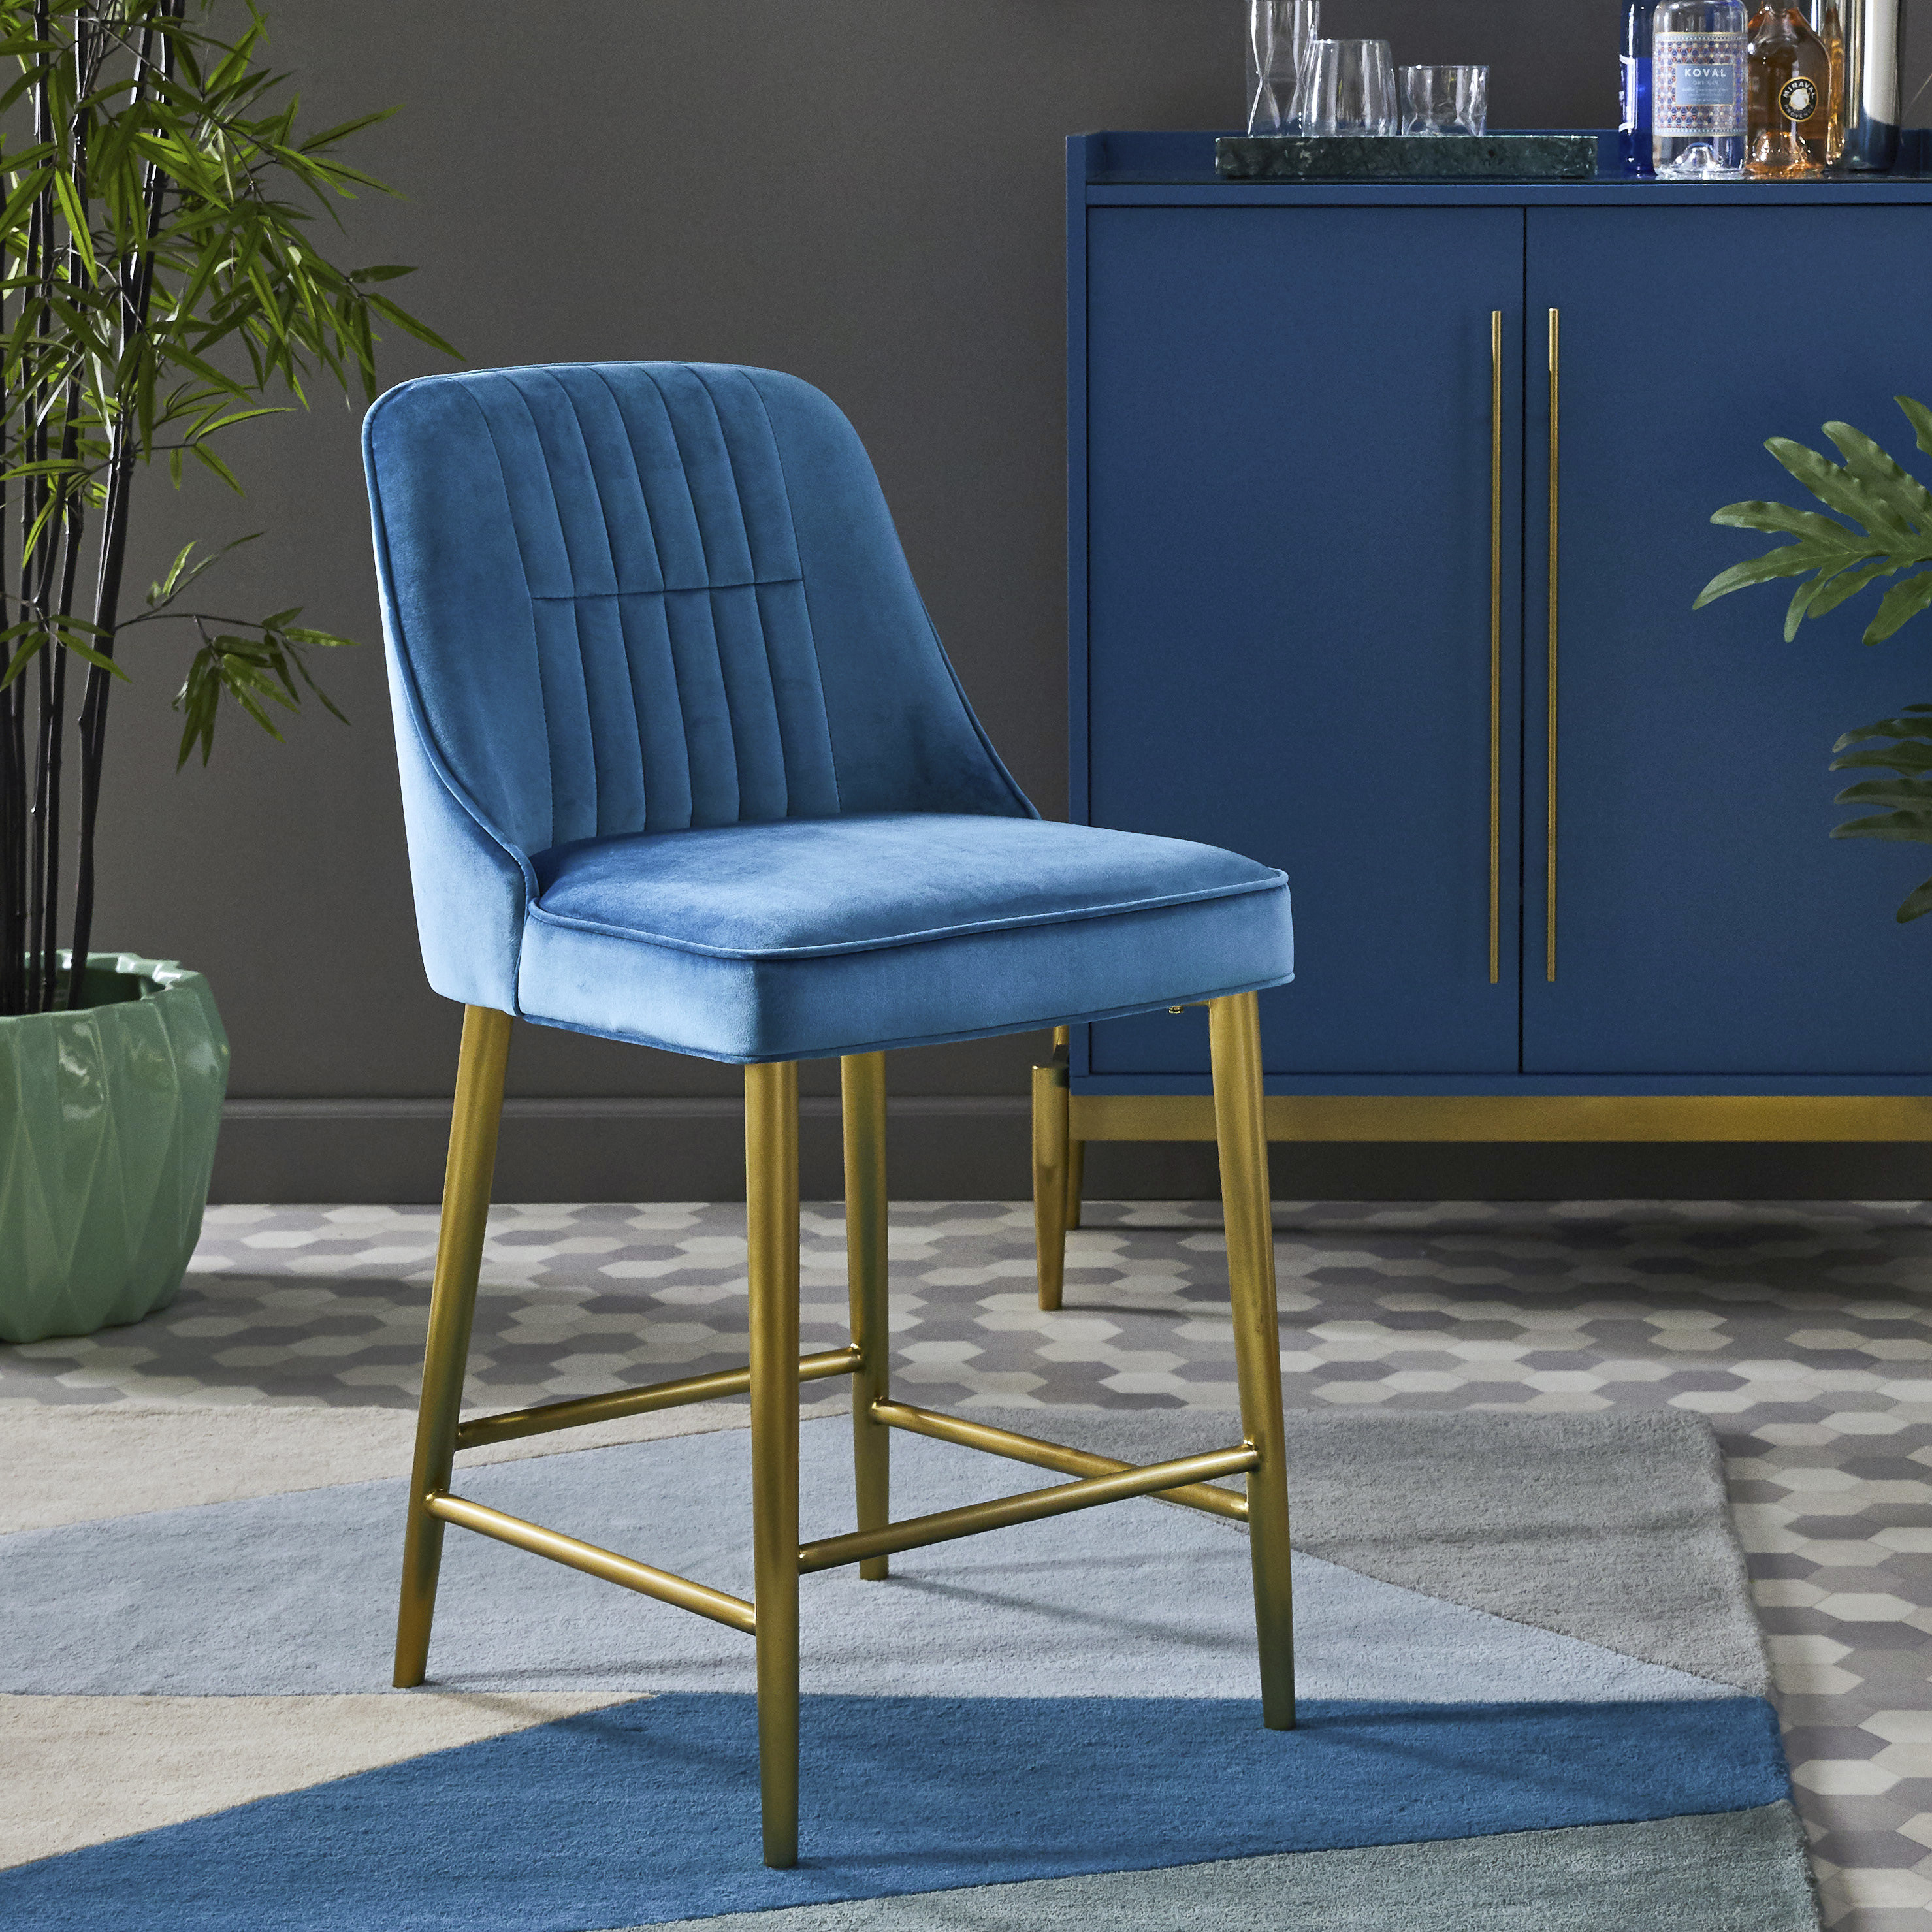 A blue velvet bar stool with gold legs